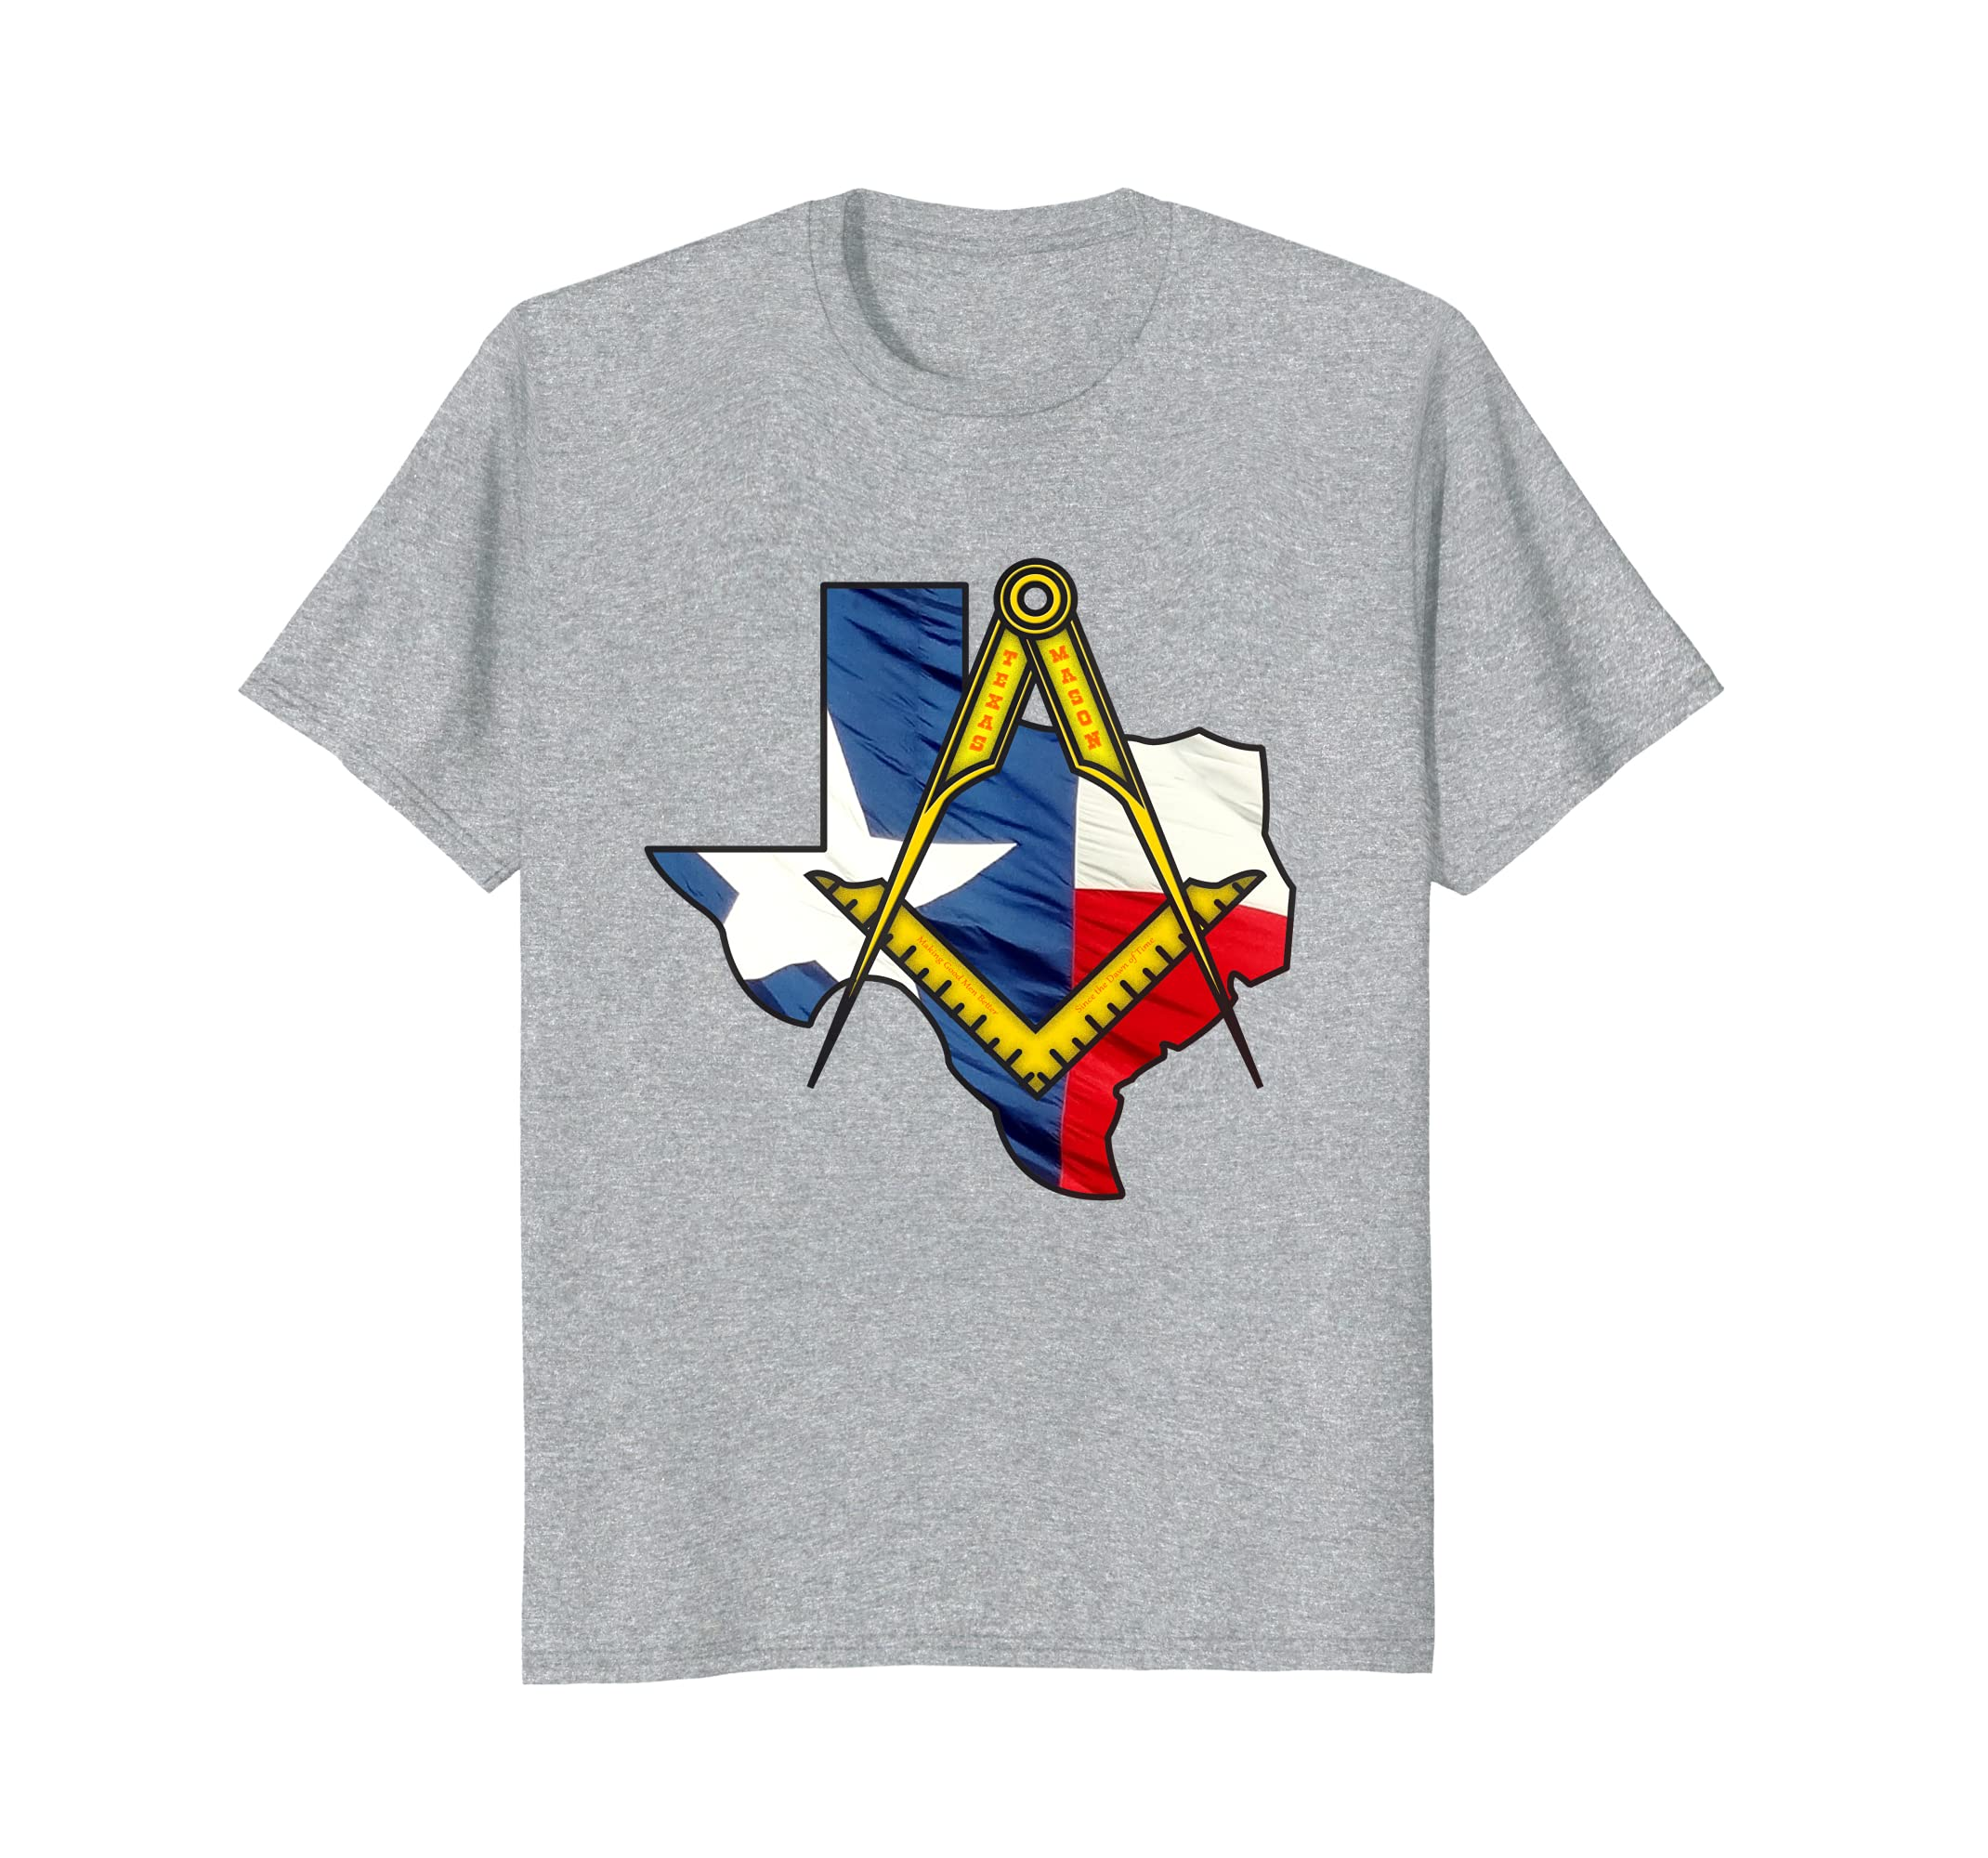 ef62ec85 Mens Texas Freemason Masonic Lodge T-Shirt-prm – Paramatee